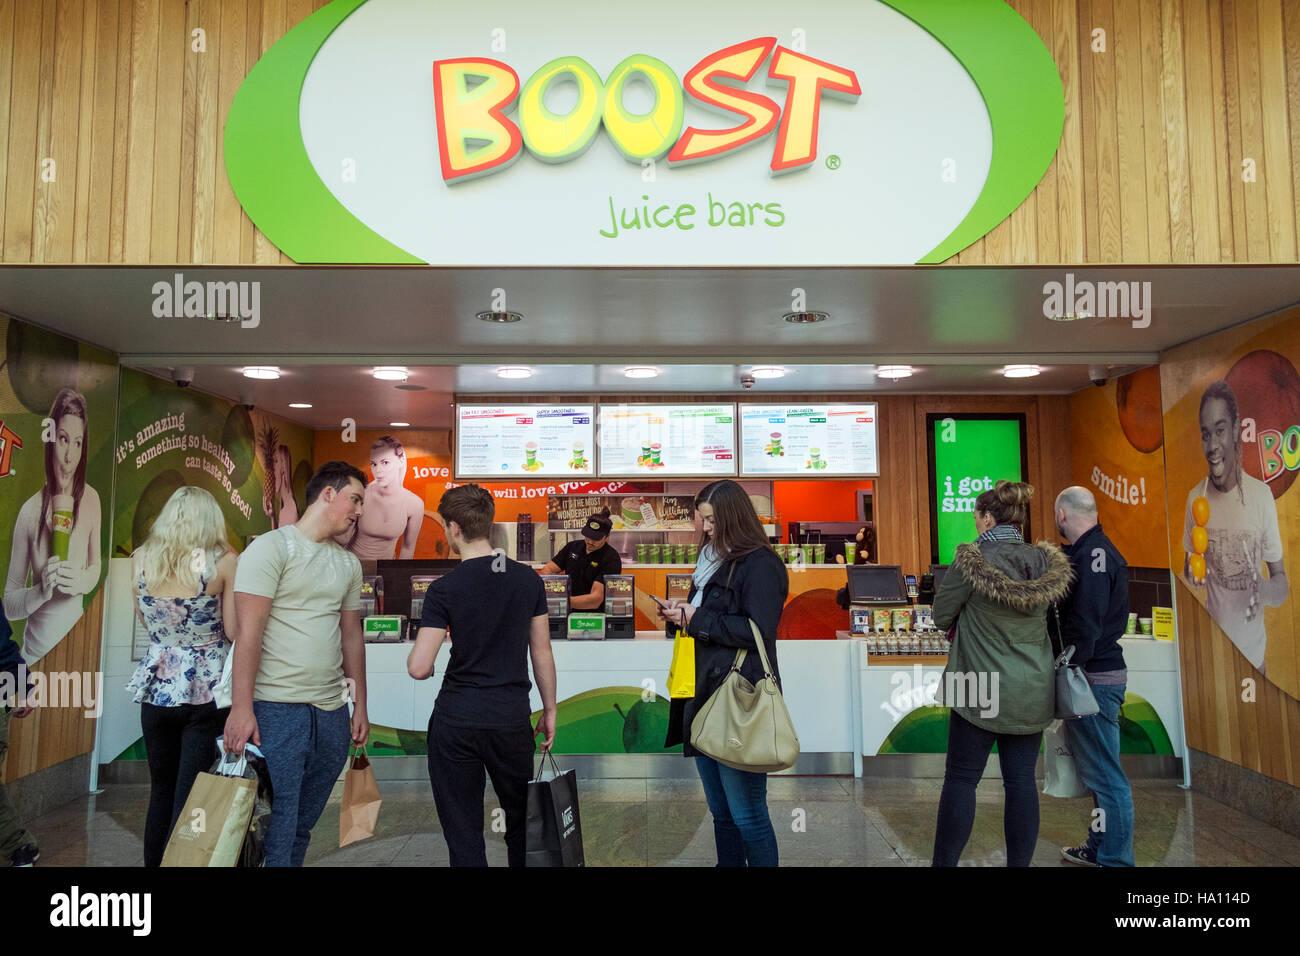 'Boost' fruit juice bars inside the Trafford Centre, Manchester, UK - Stock Image